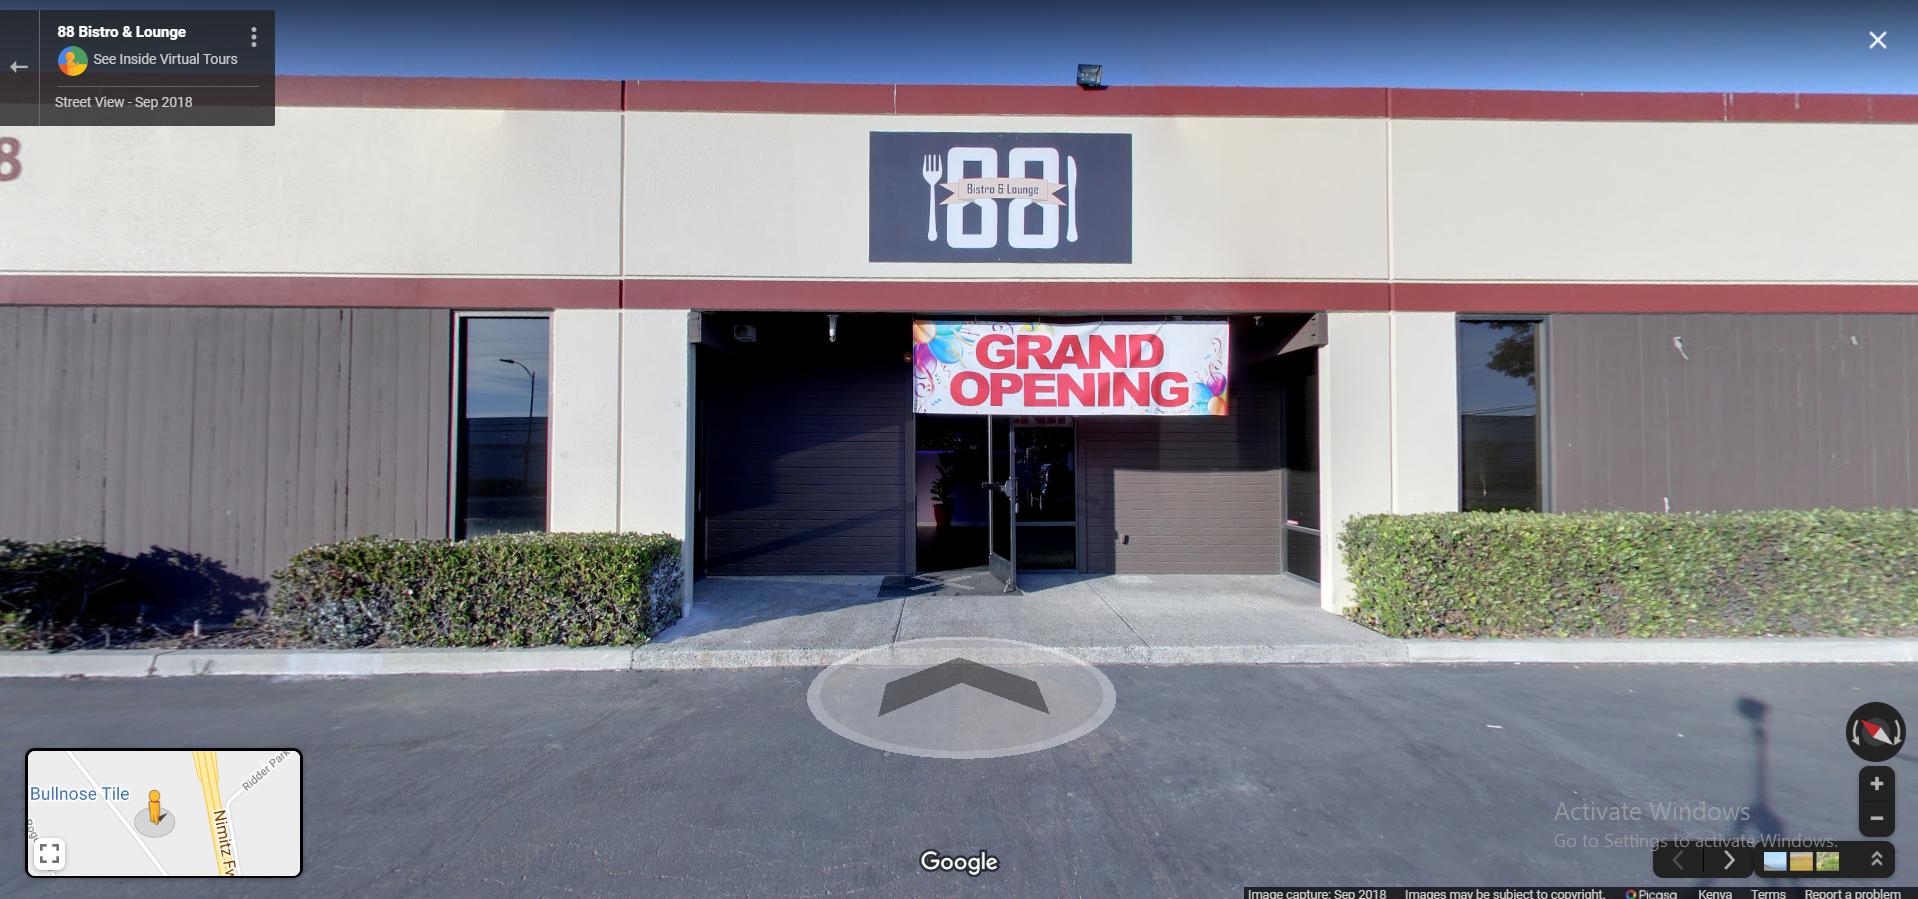 88 Bistro & Lounge  San Jose